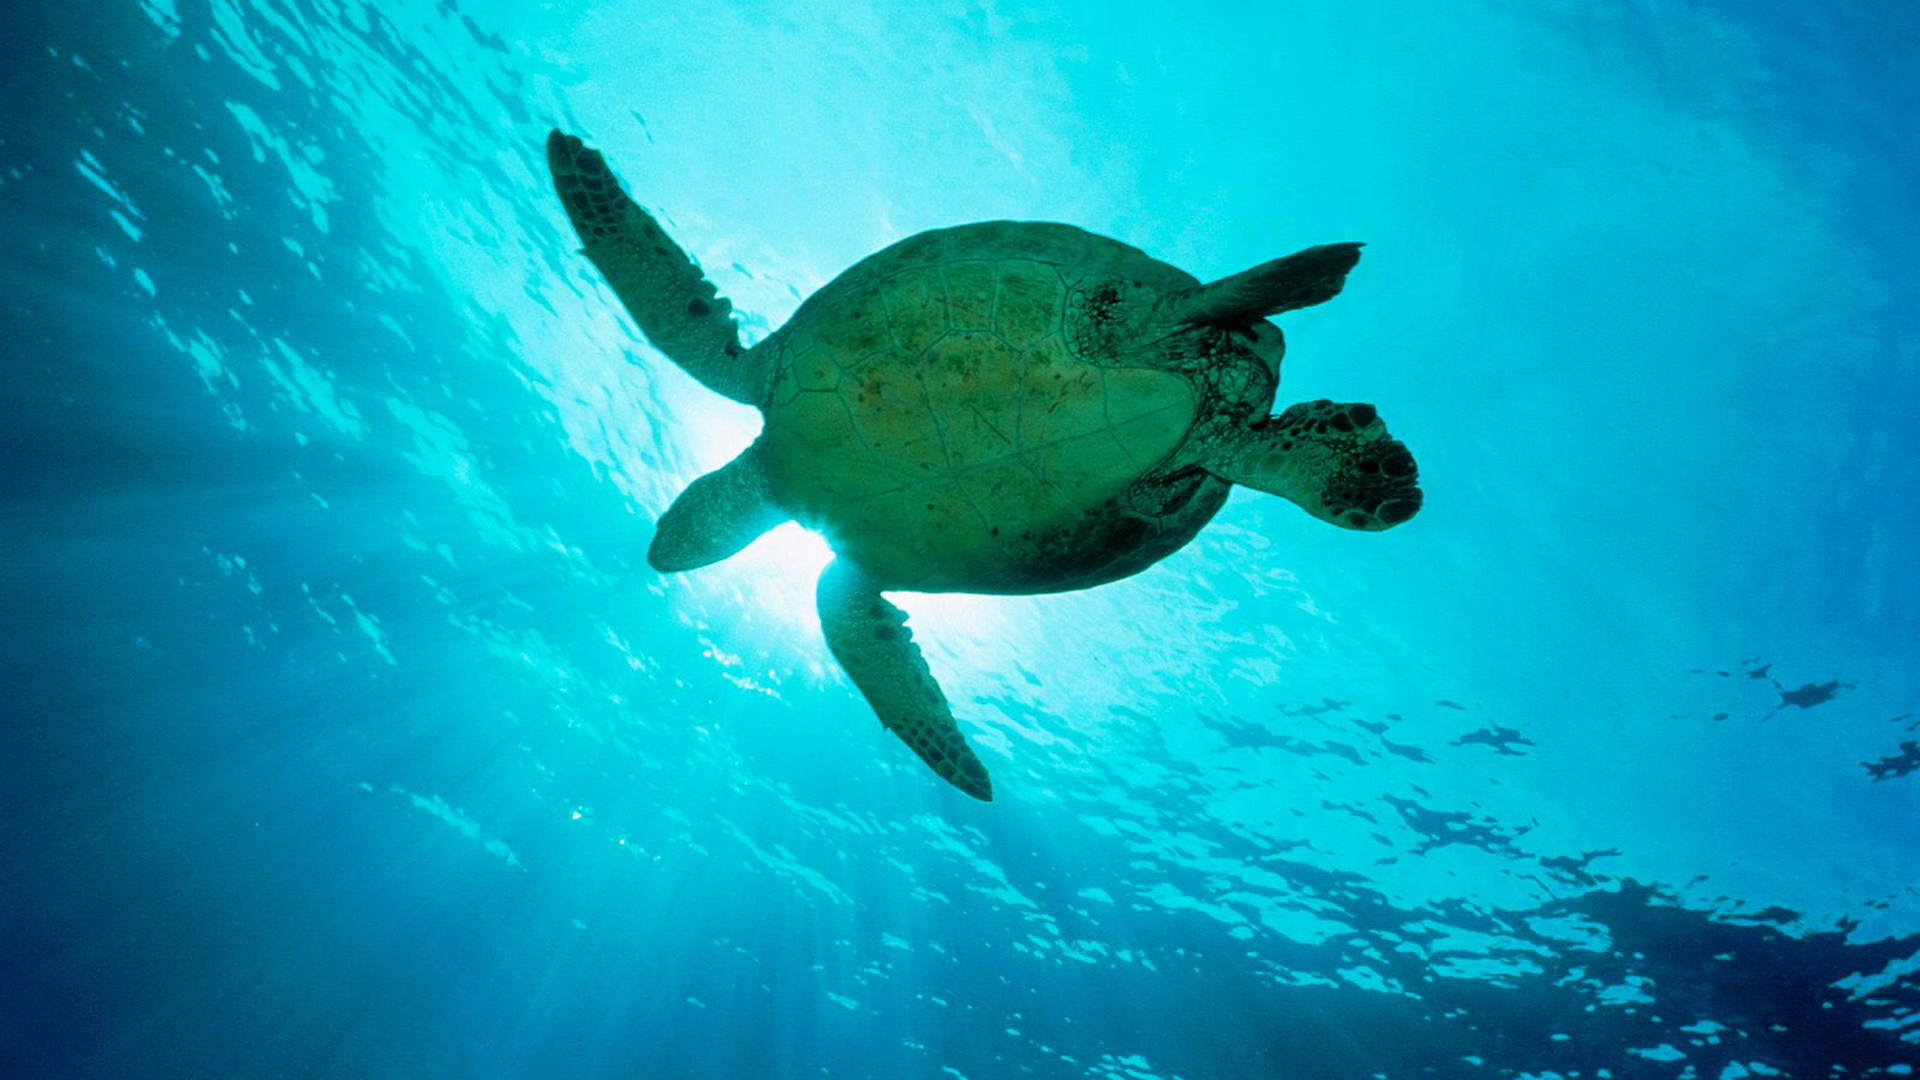 Sea Turtles Wallpaper 1920x1080 Sea Turtles 1920x1080